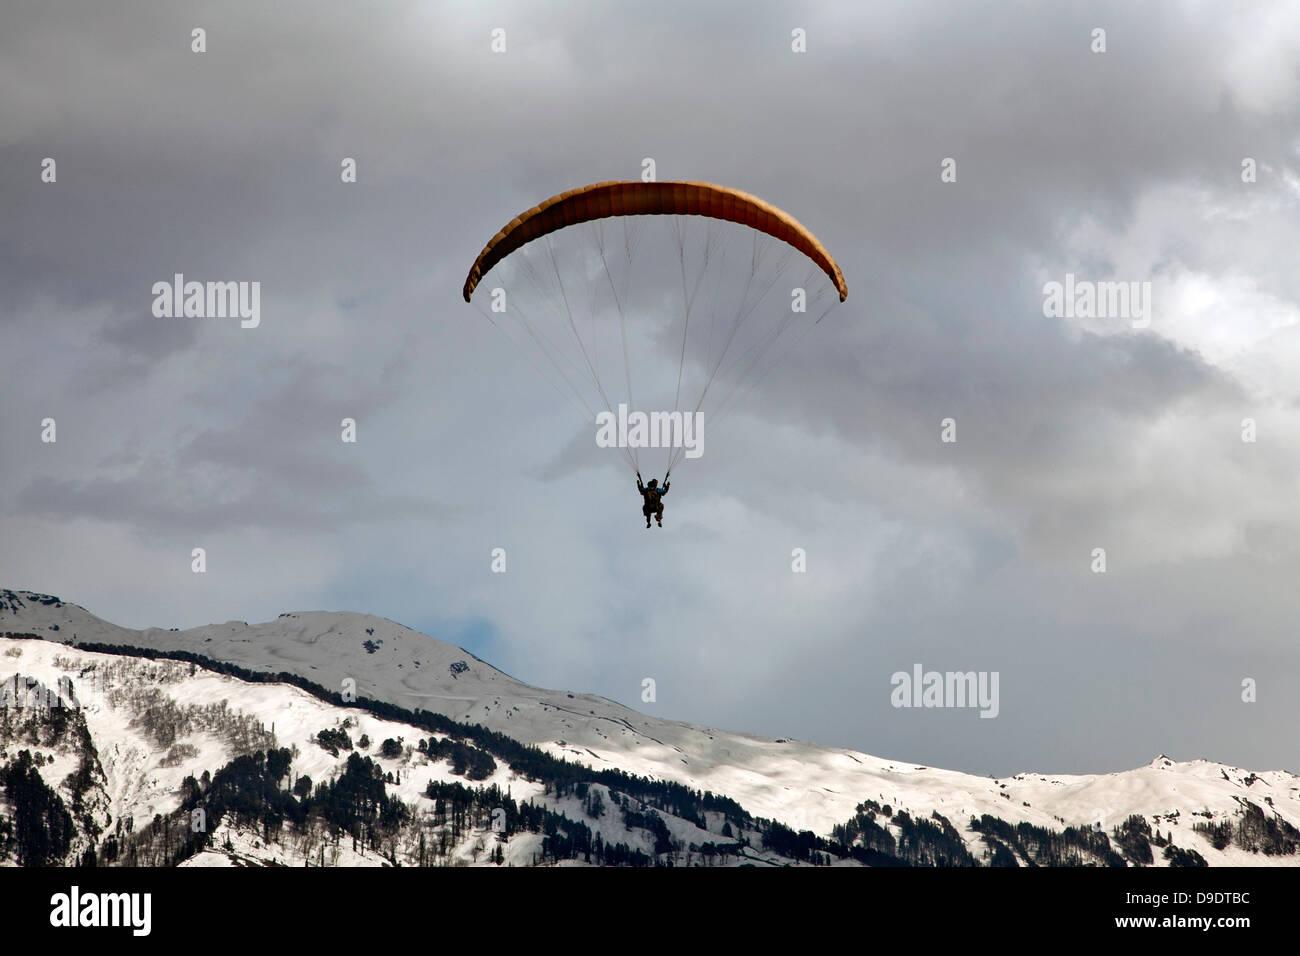 Paragliding in the sky, Manali, Himachal Pradesh, India - Stock Image